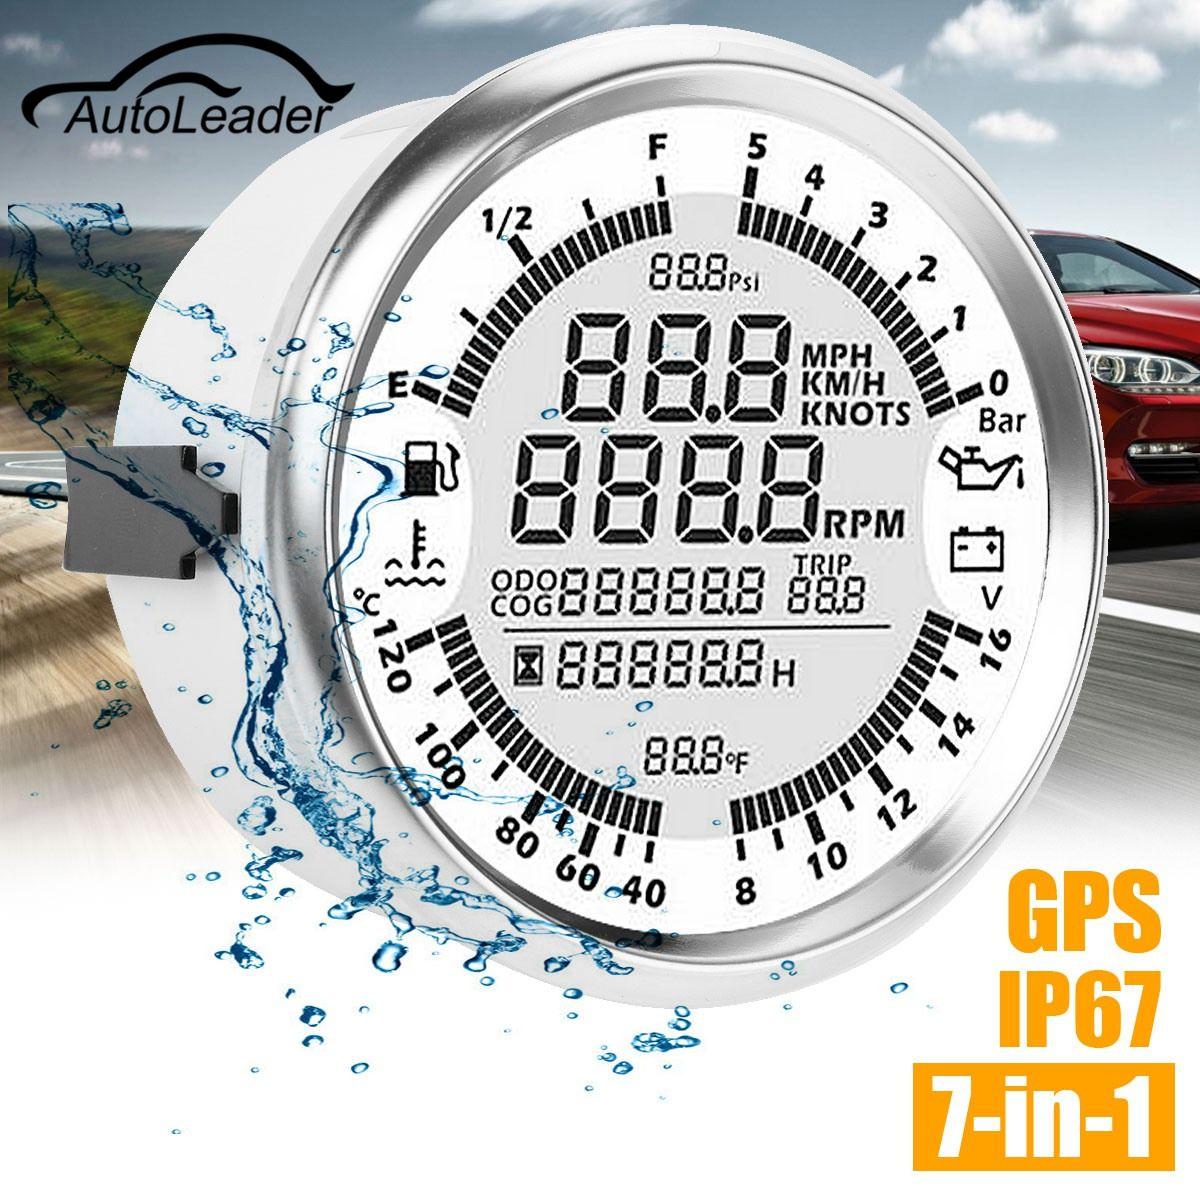 Autoleader 85mm GPS Speedometer Oil Pressure Gauge Fuel Gauge Tachometer Speed Boat Car DIY